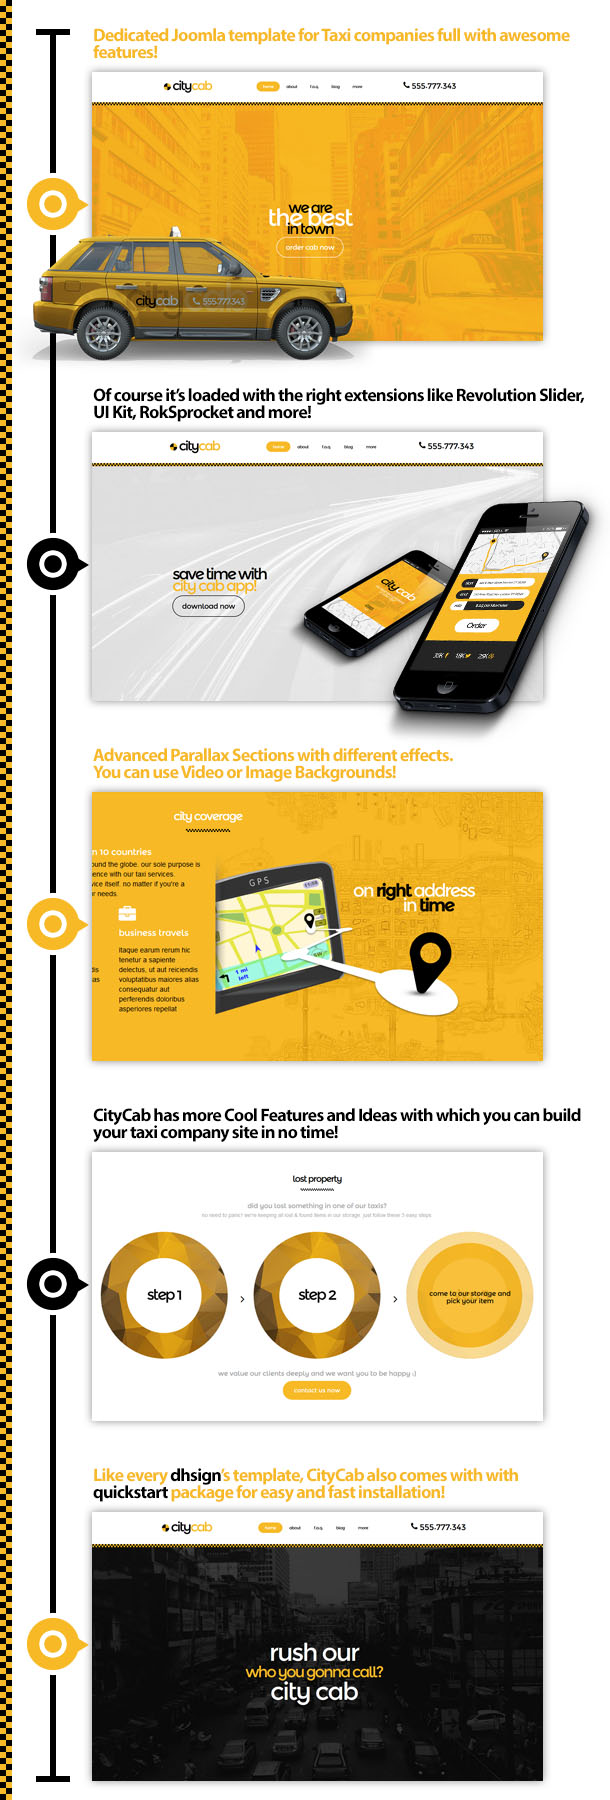 CityCab - Taxi Company Responsive Joomla Template